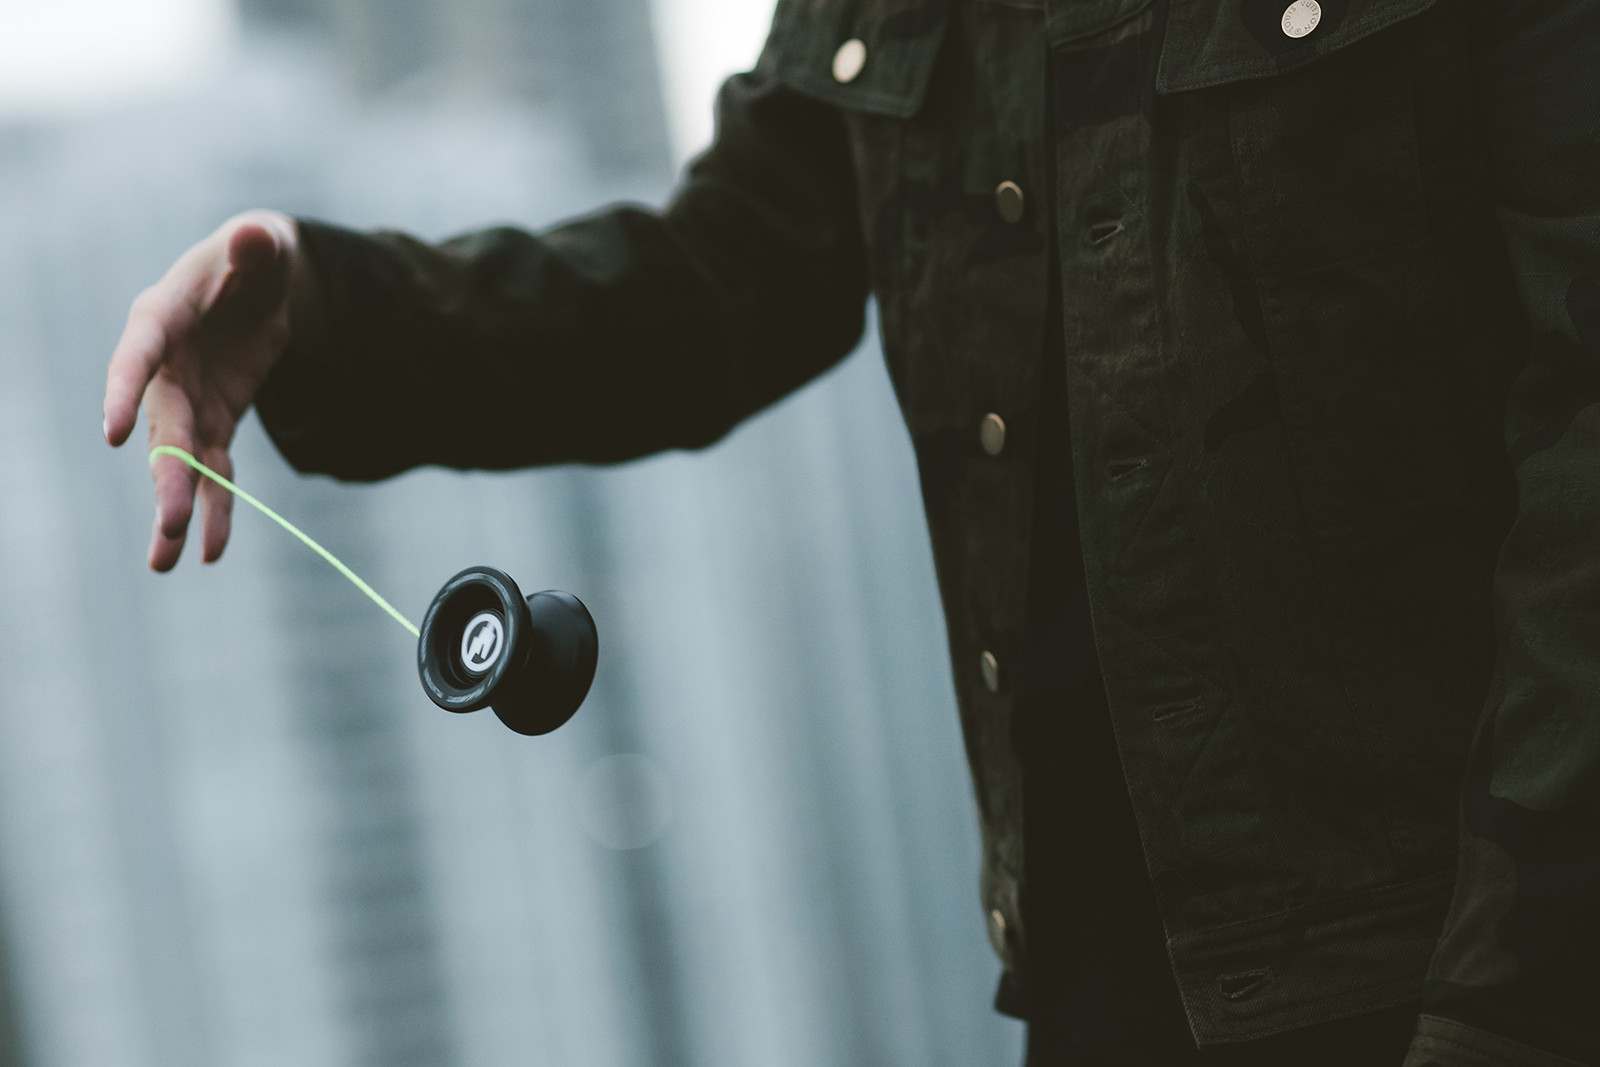 HYPEBEAST 專訪 Yo-Yo 品牌 FRESHTHINGS 主理人鈴木裕之